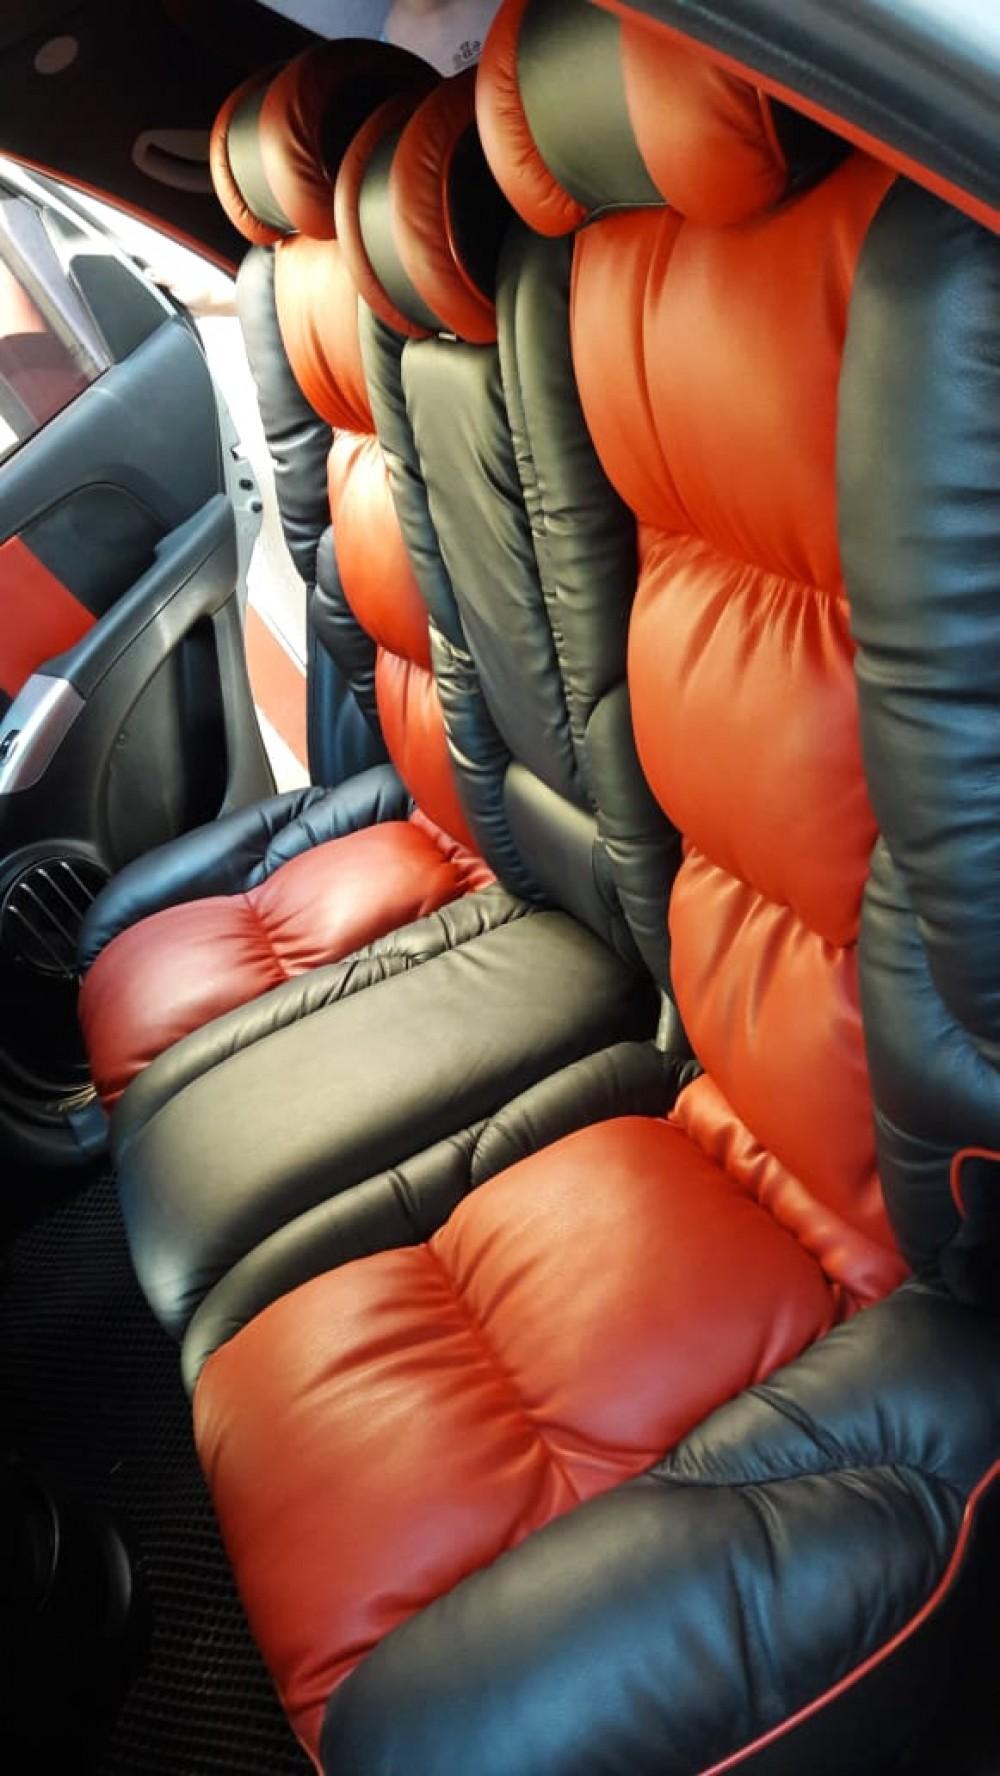 Cubierta de asiento rojo sin kia Sportage